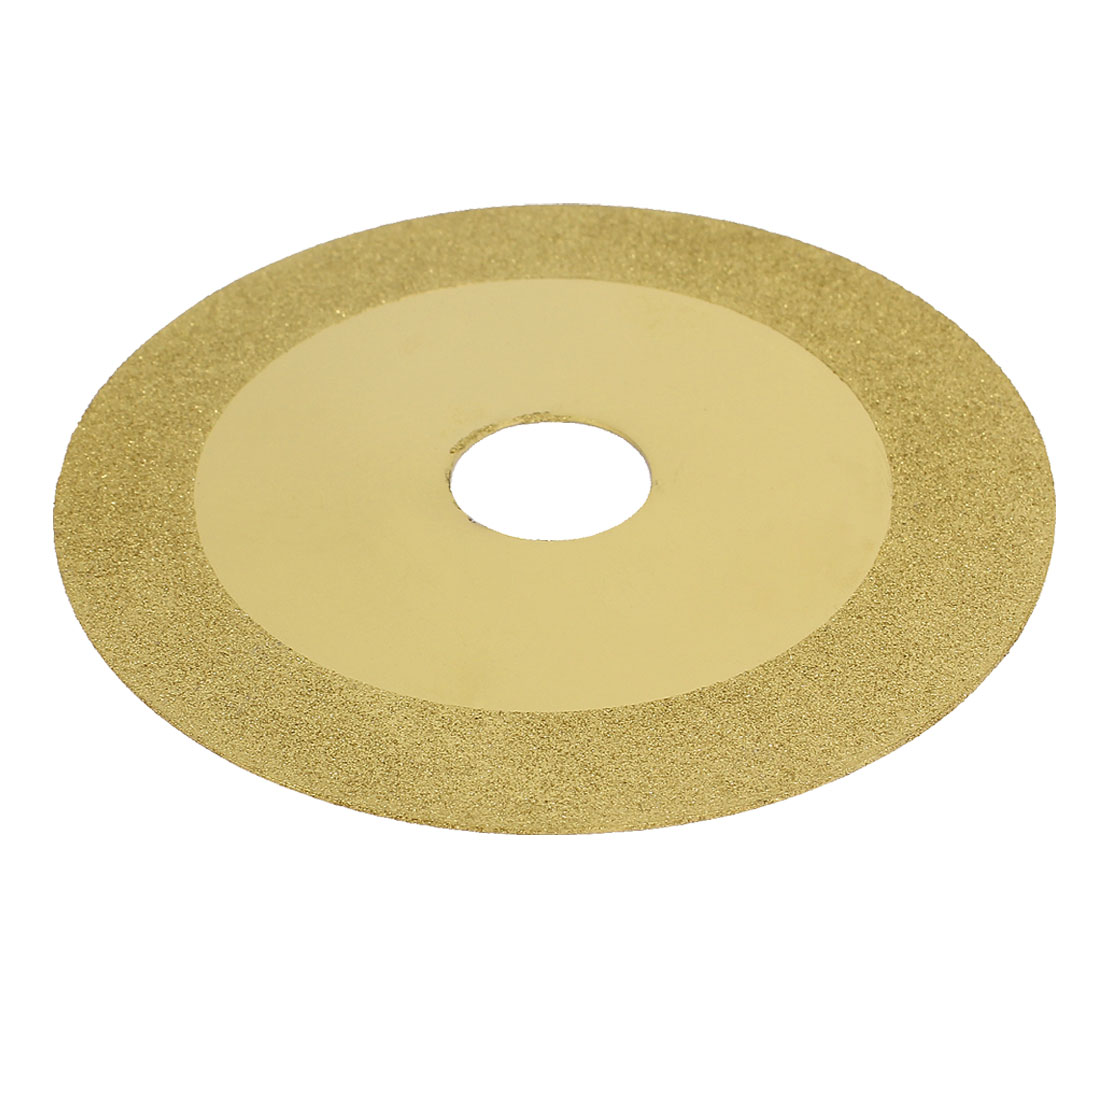 100mm 4 Diamond Coated Grinding Disc Glass Ceramic Tile Cutting